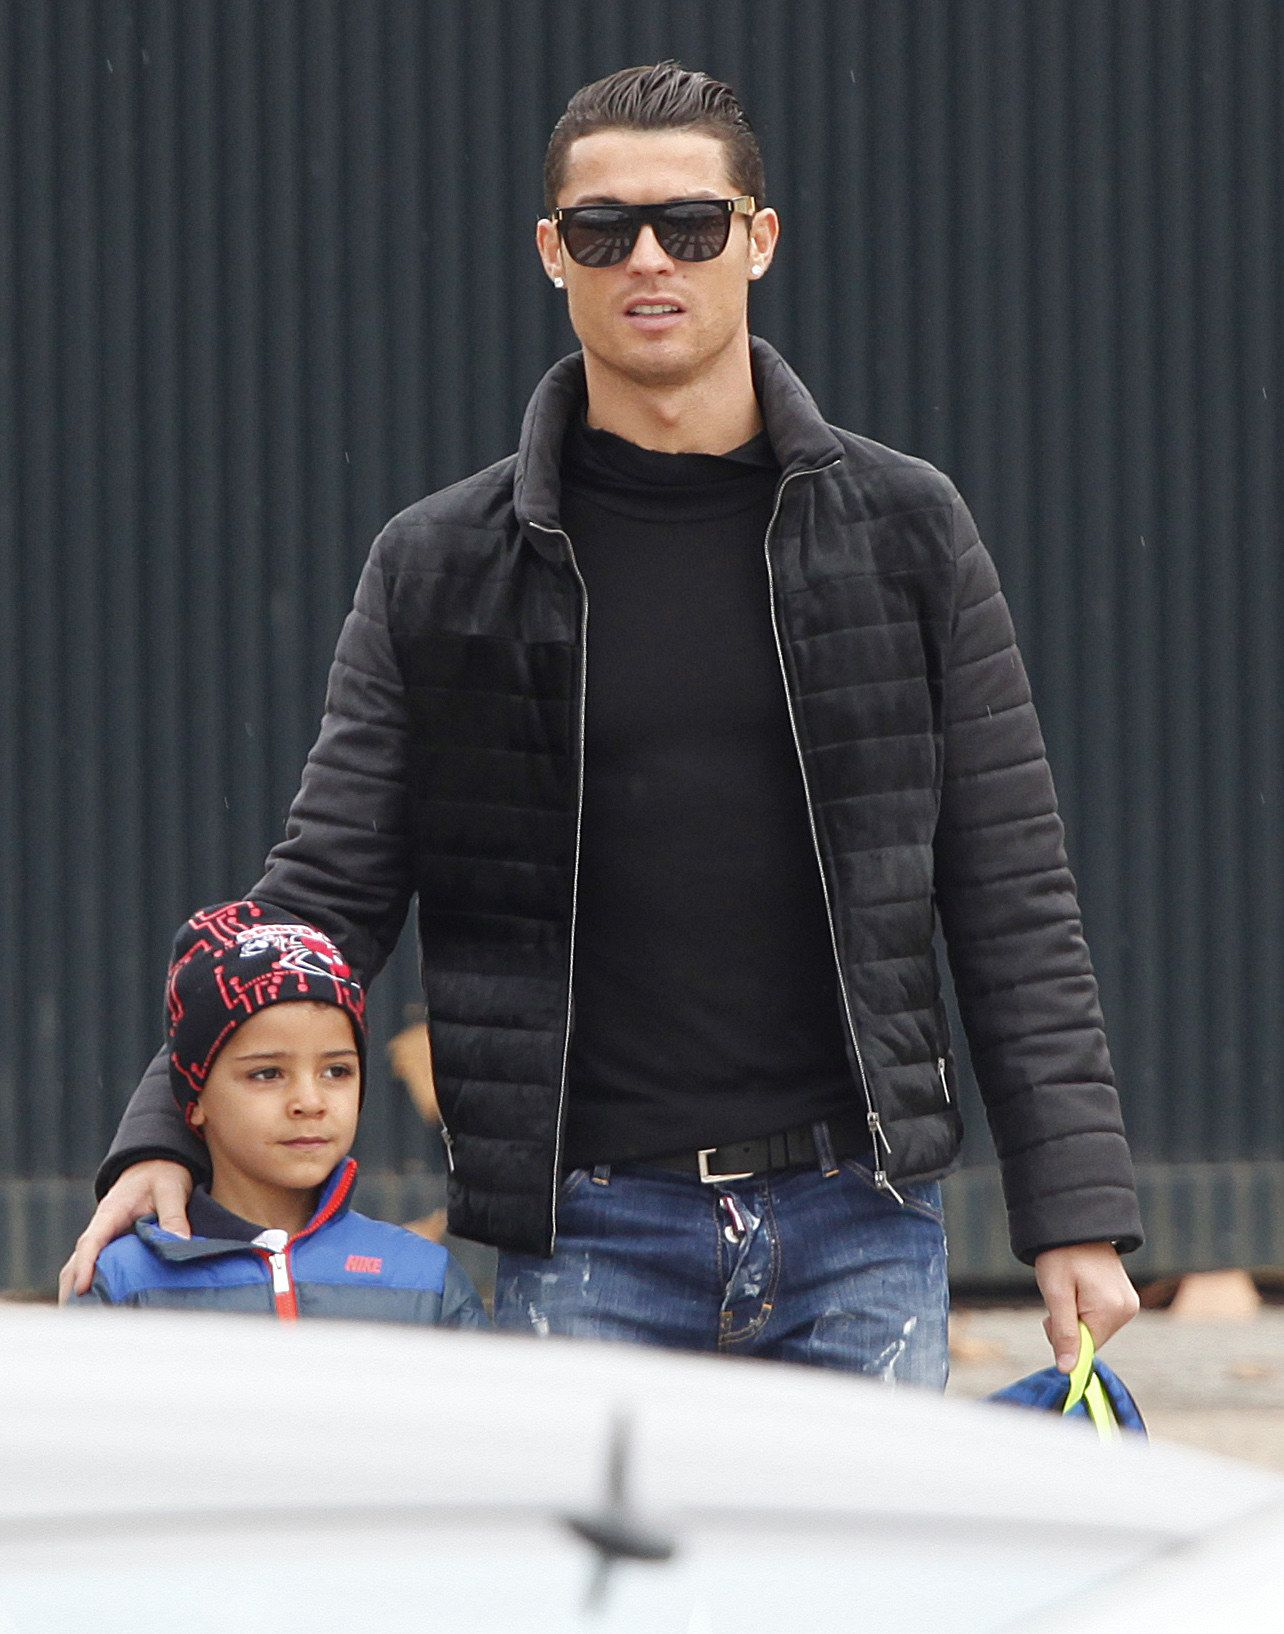 Have An Inquiring Mind Felpa Cr7 Cristiano Ronaldo Juventus Calcio Uomo Bambino T-shirt E Maglie Bambini 2 - 16 Anni